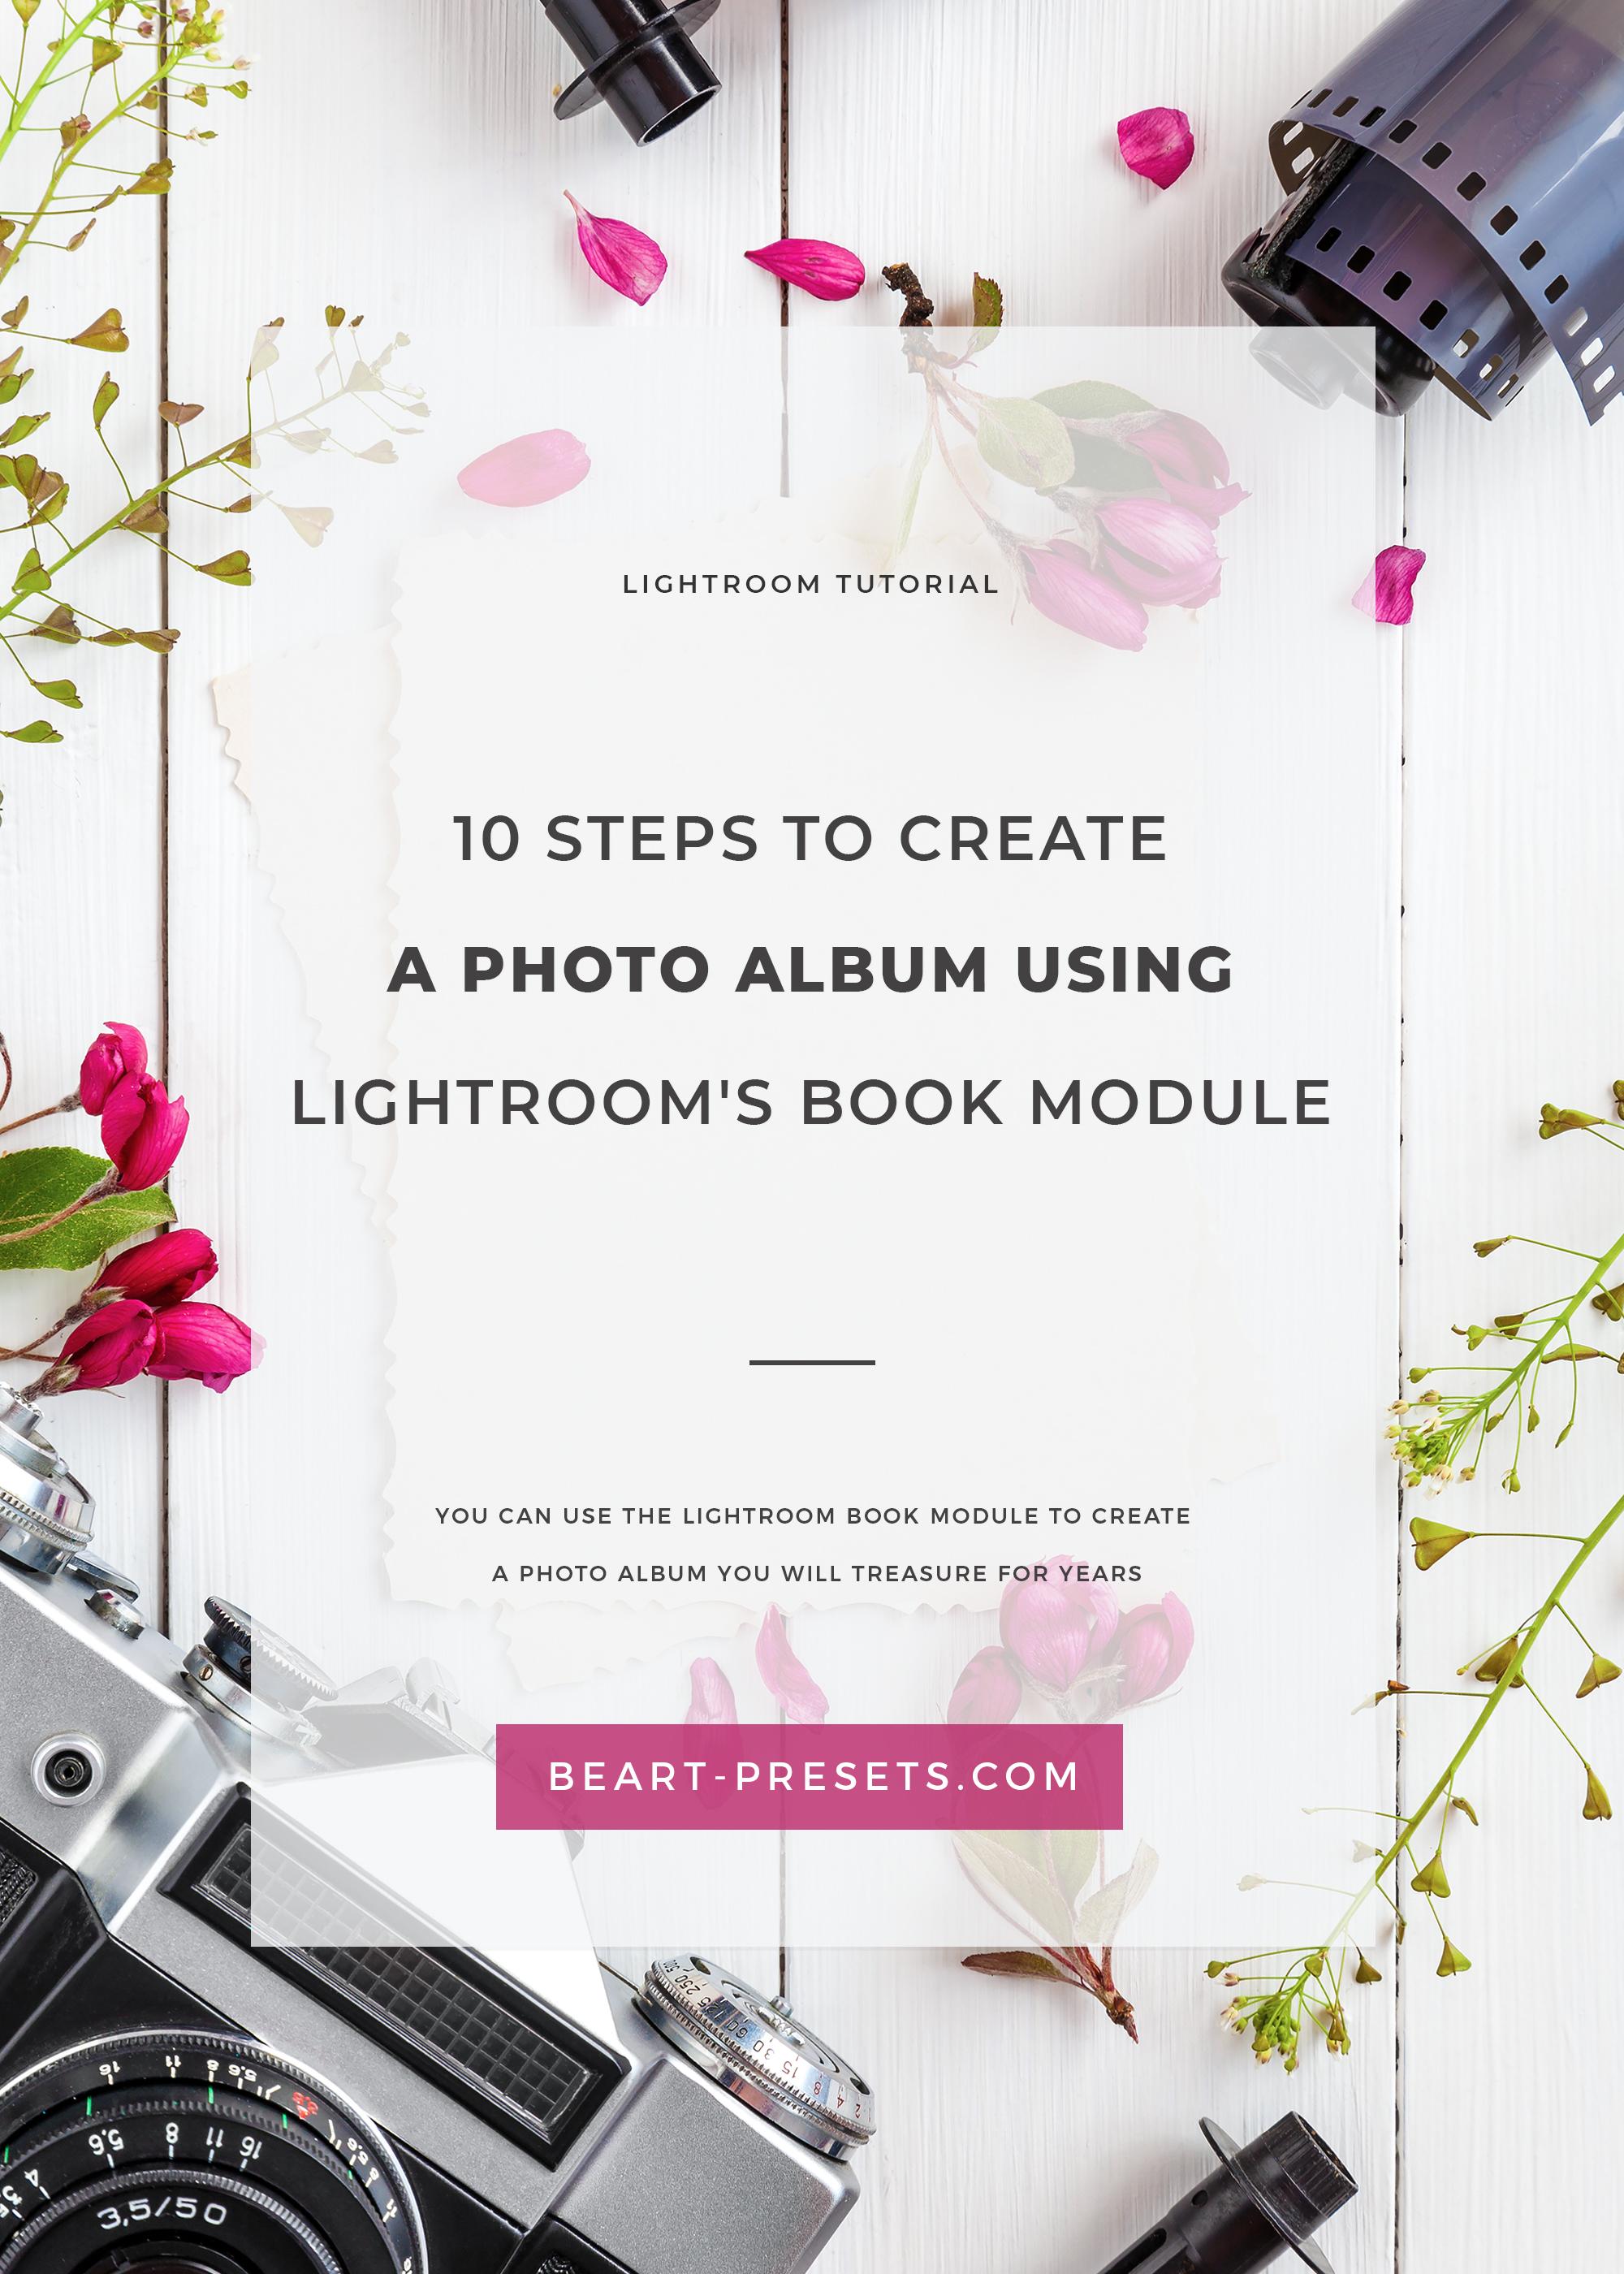 CREATE A PHOTO ALBUM USING LIGHTROOM'S BOOK MODULE